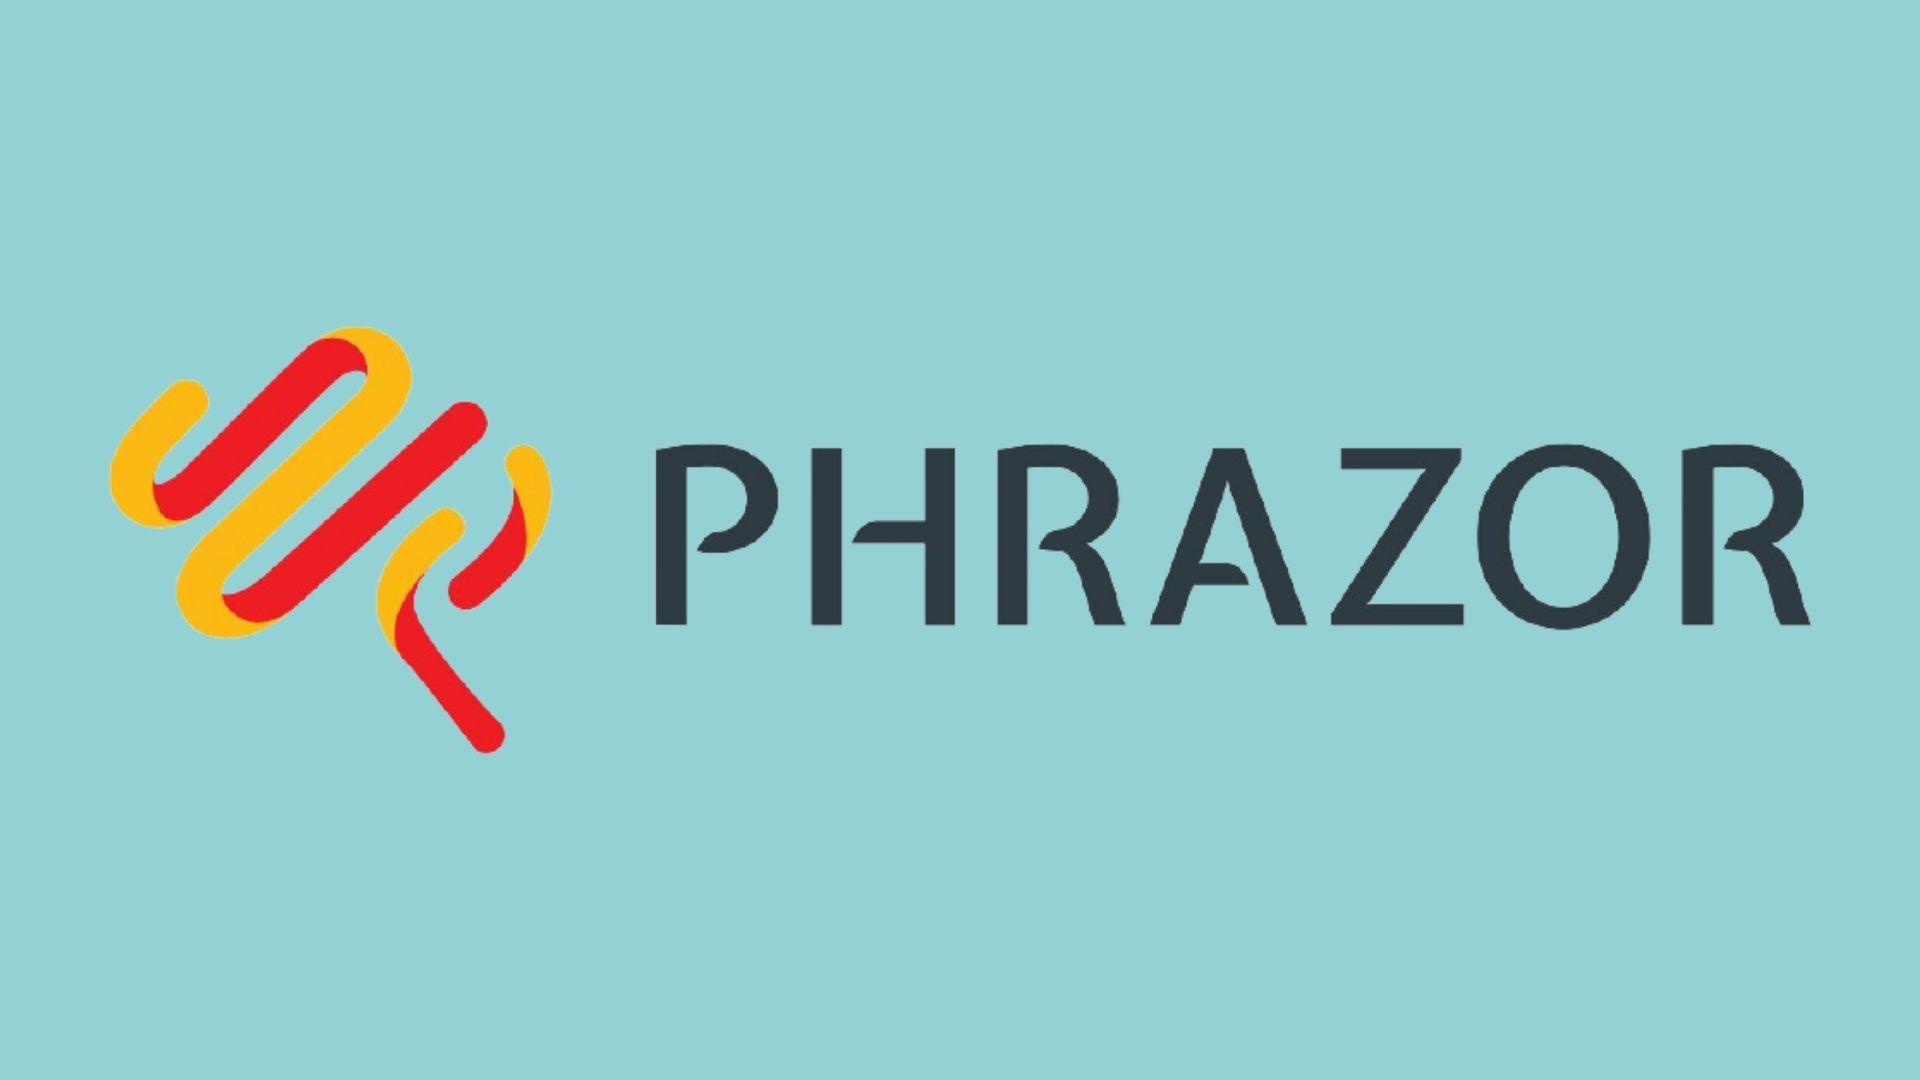 Phrazor